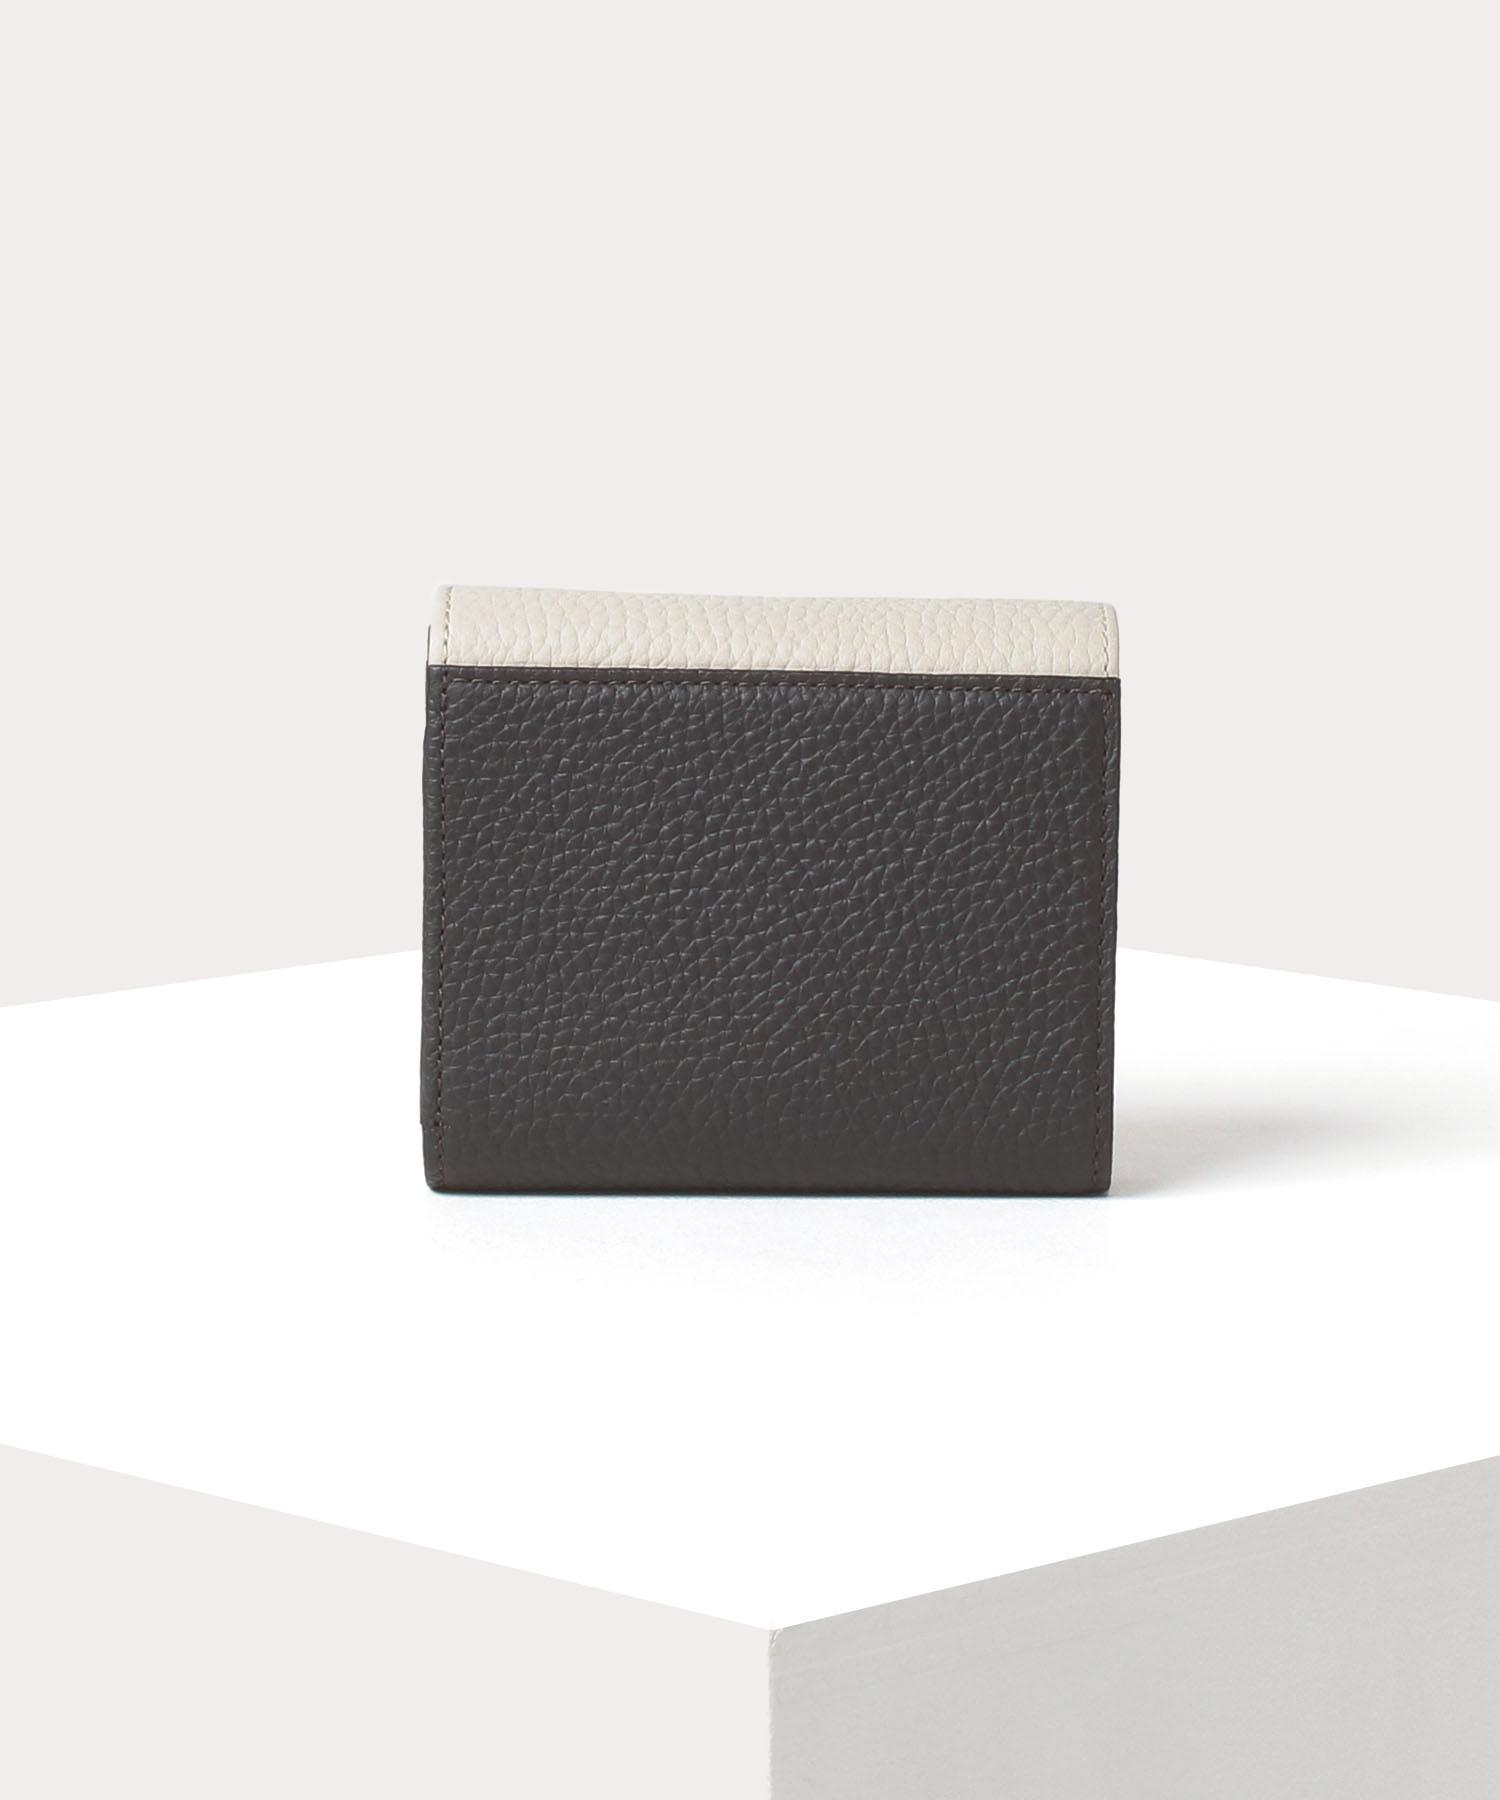 NEW ダブルフラップ 二つ折り財布